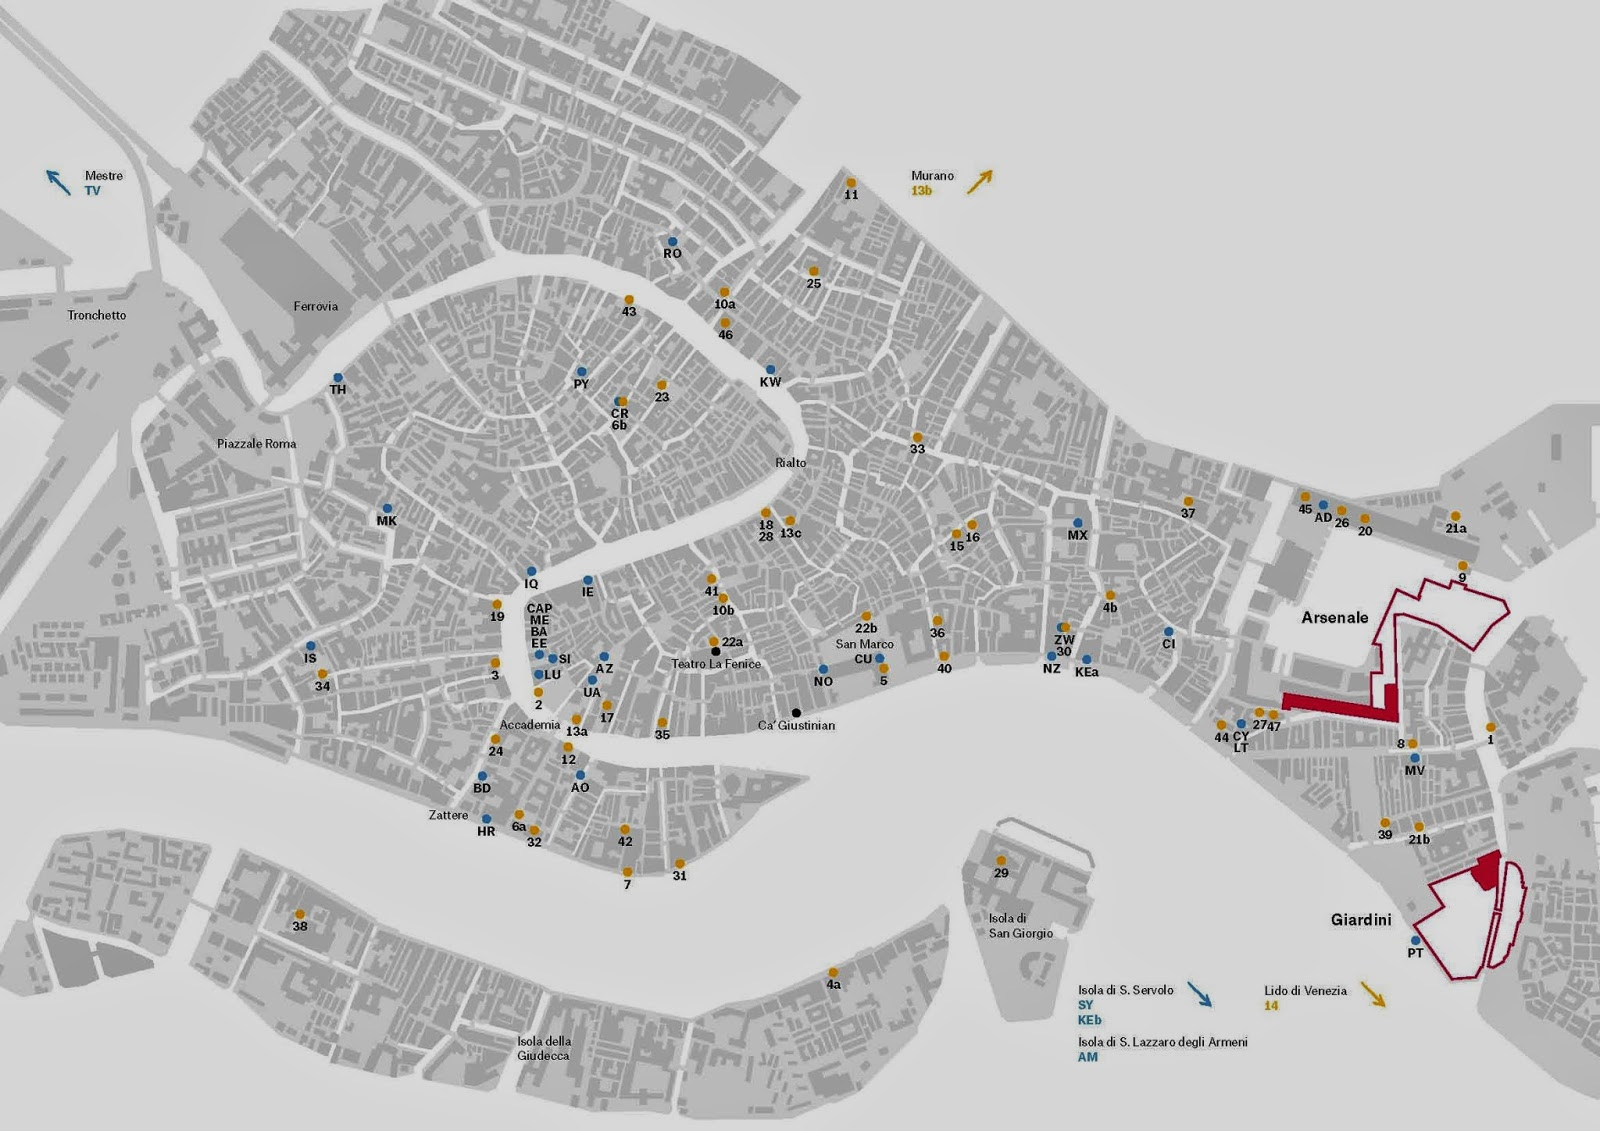 Biennale Di Venezia Mappa Della Biennale Di Venezia - Venice biennale 2016 map